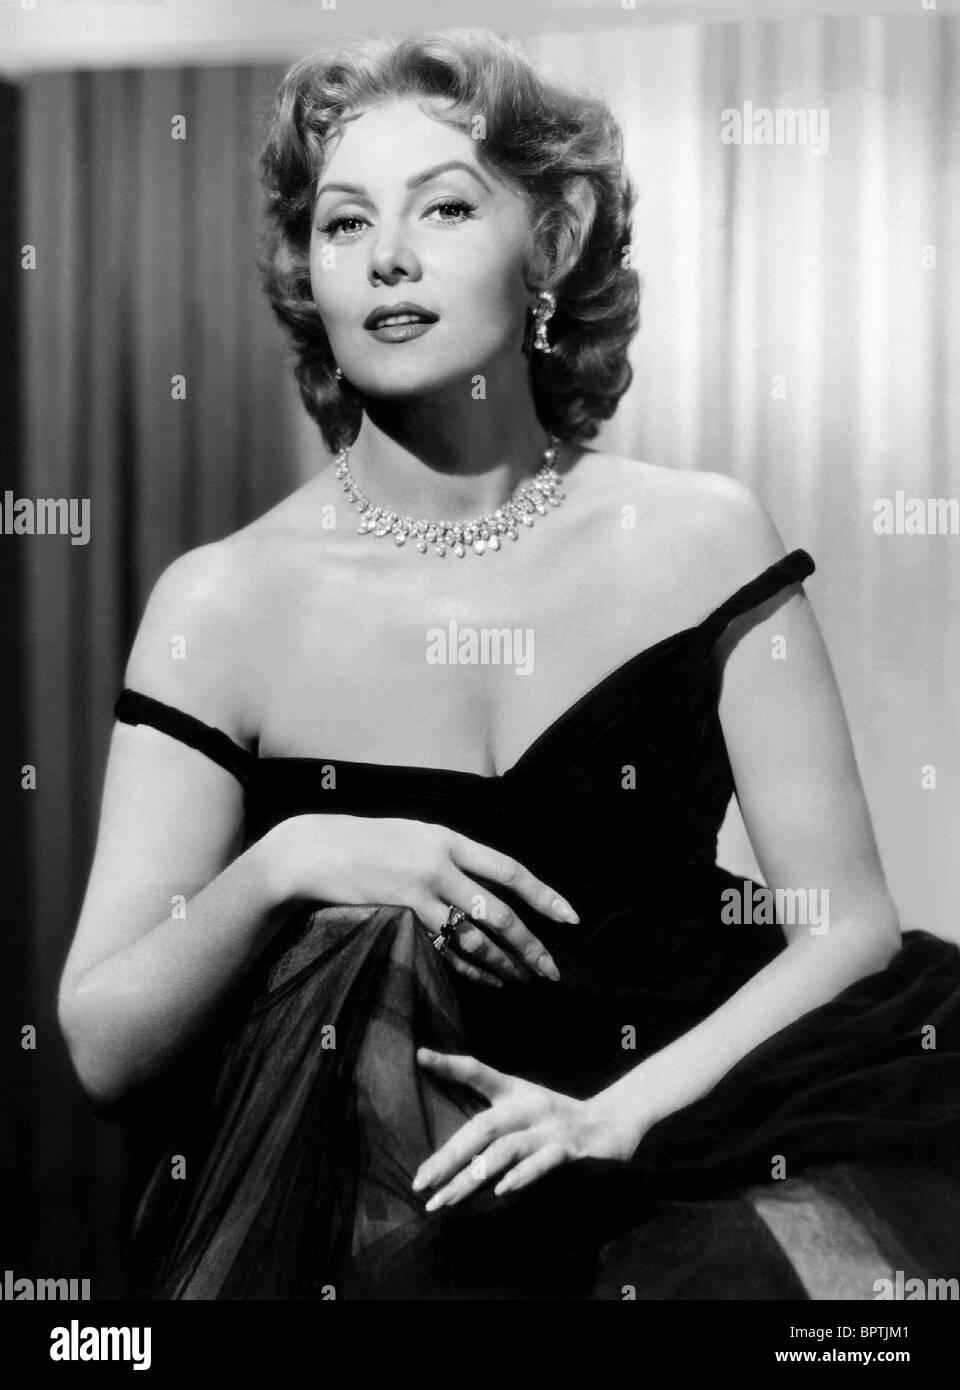 RHONDA FLEMING ACTRESS (1952) - Stock Image